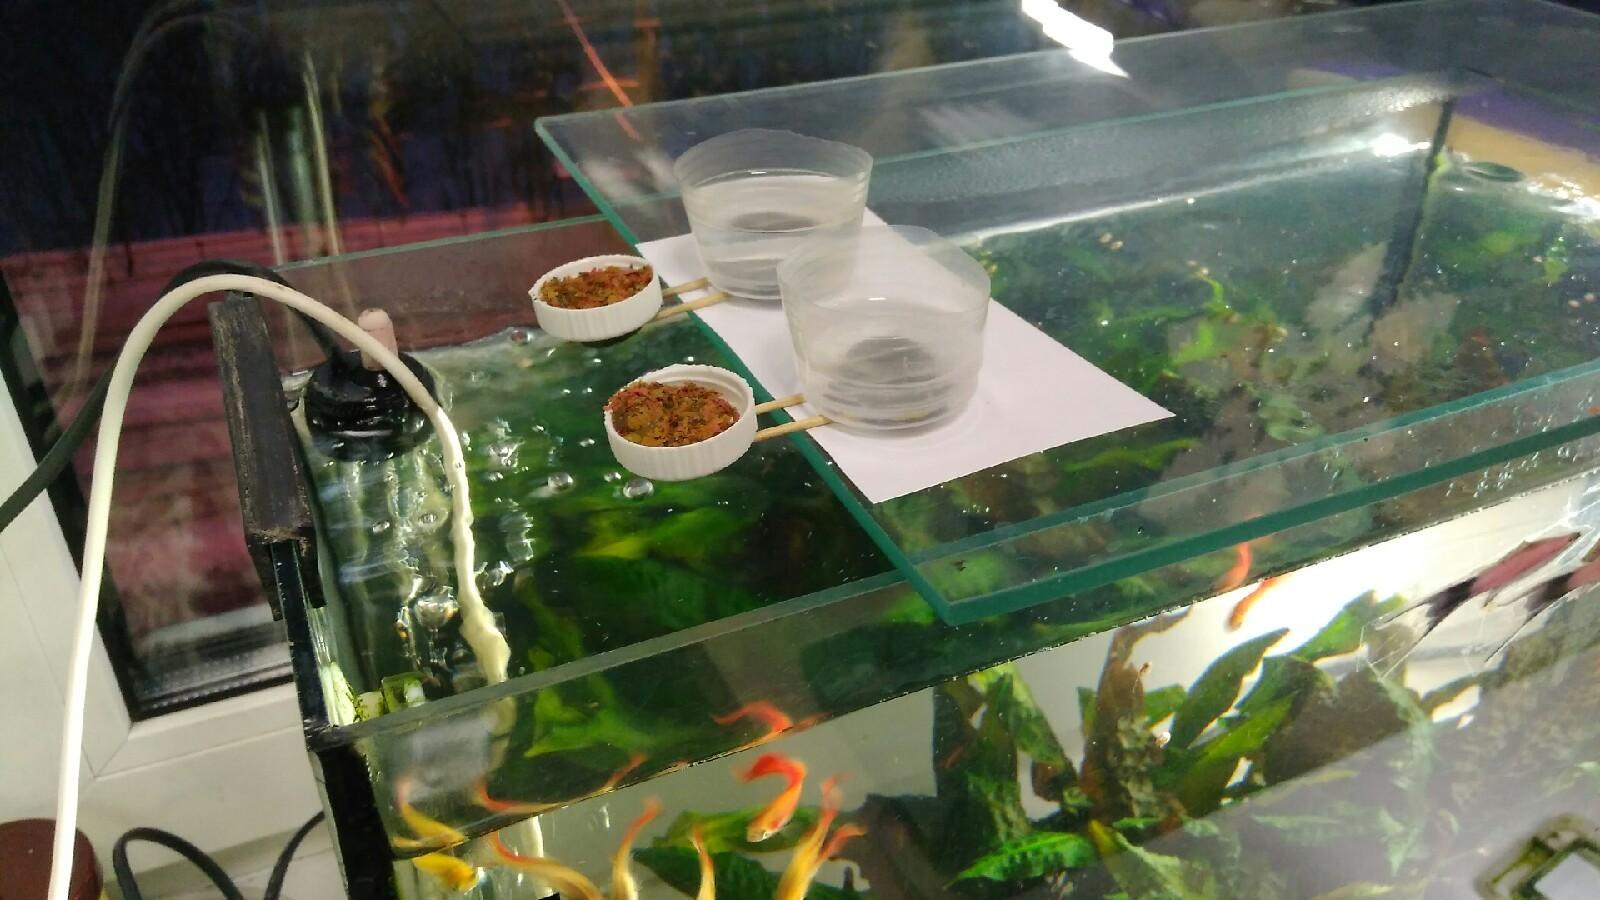 Кормушка для рыбок в аквариуме своими руками фото 112